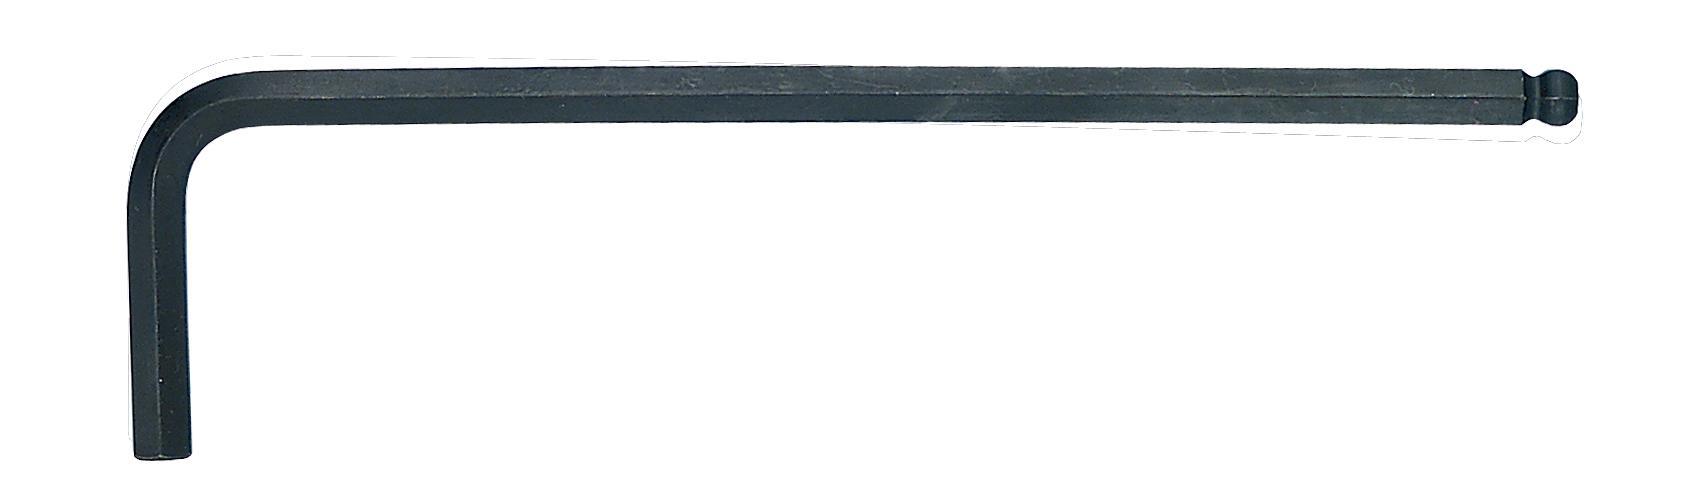 Ключ Felo 35503000